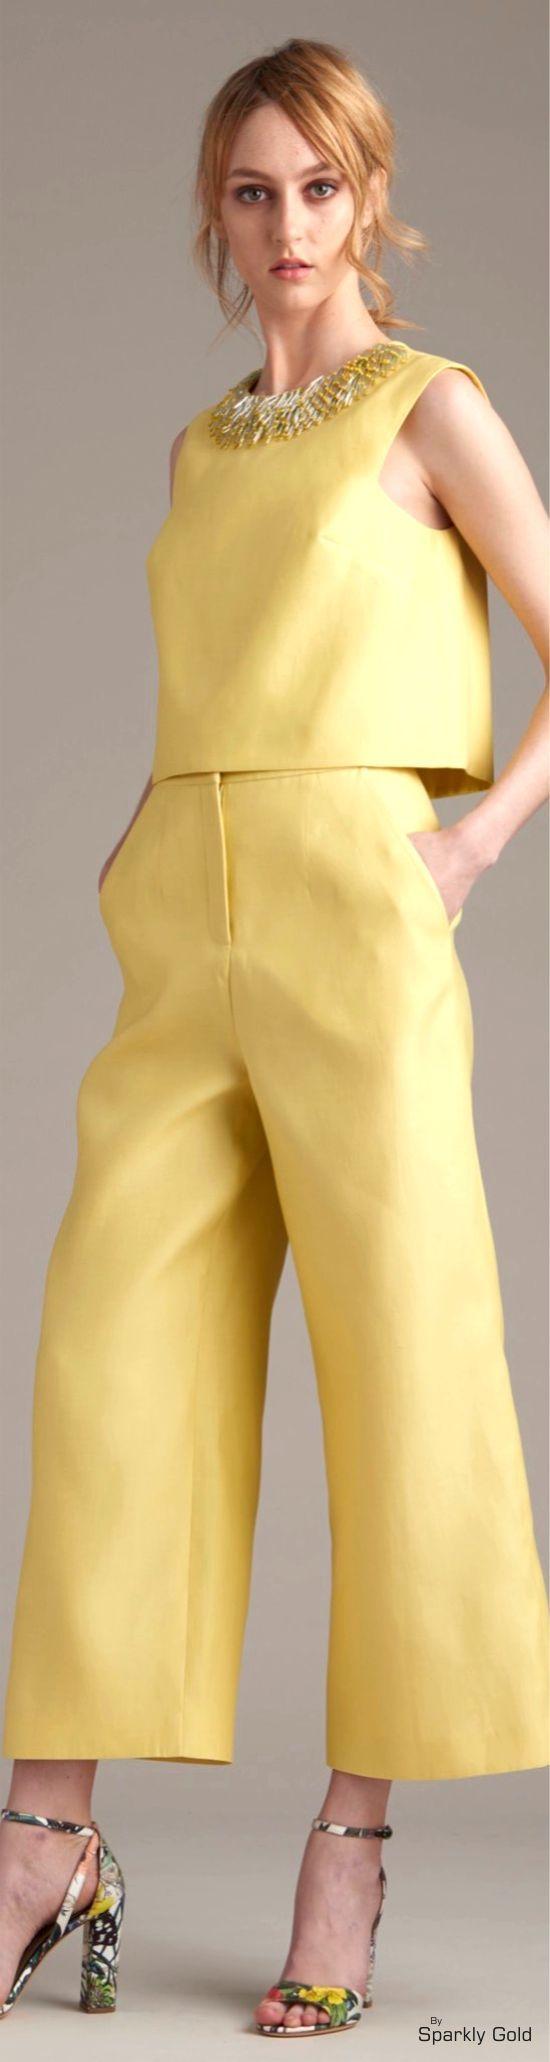 Monique Lhuillier Resort 2016 women fashion outfit clothing style apparel @roressclothes closet ideas